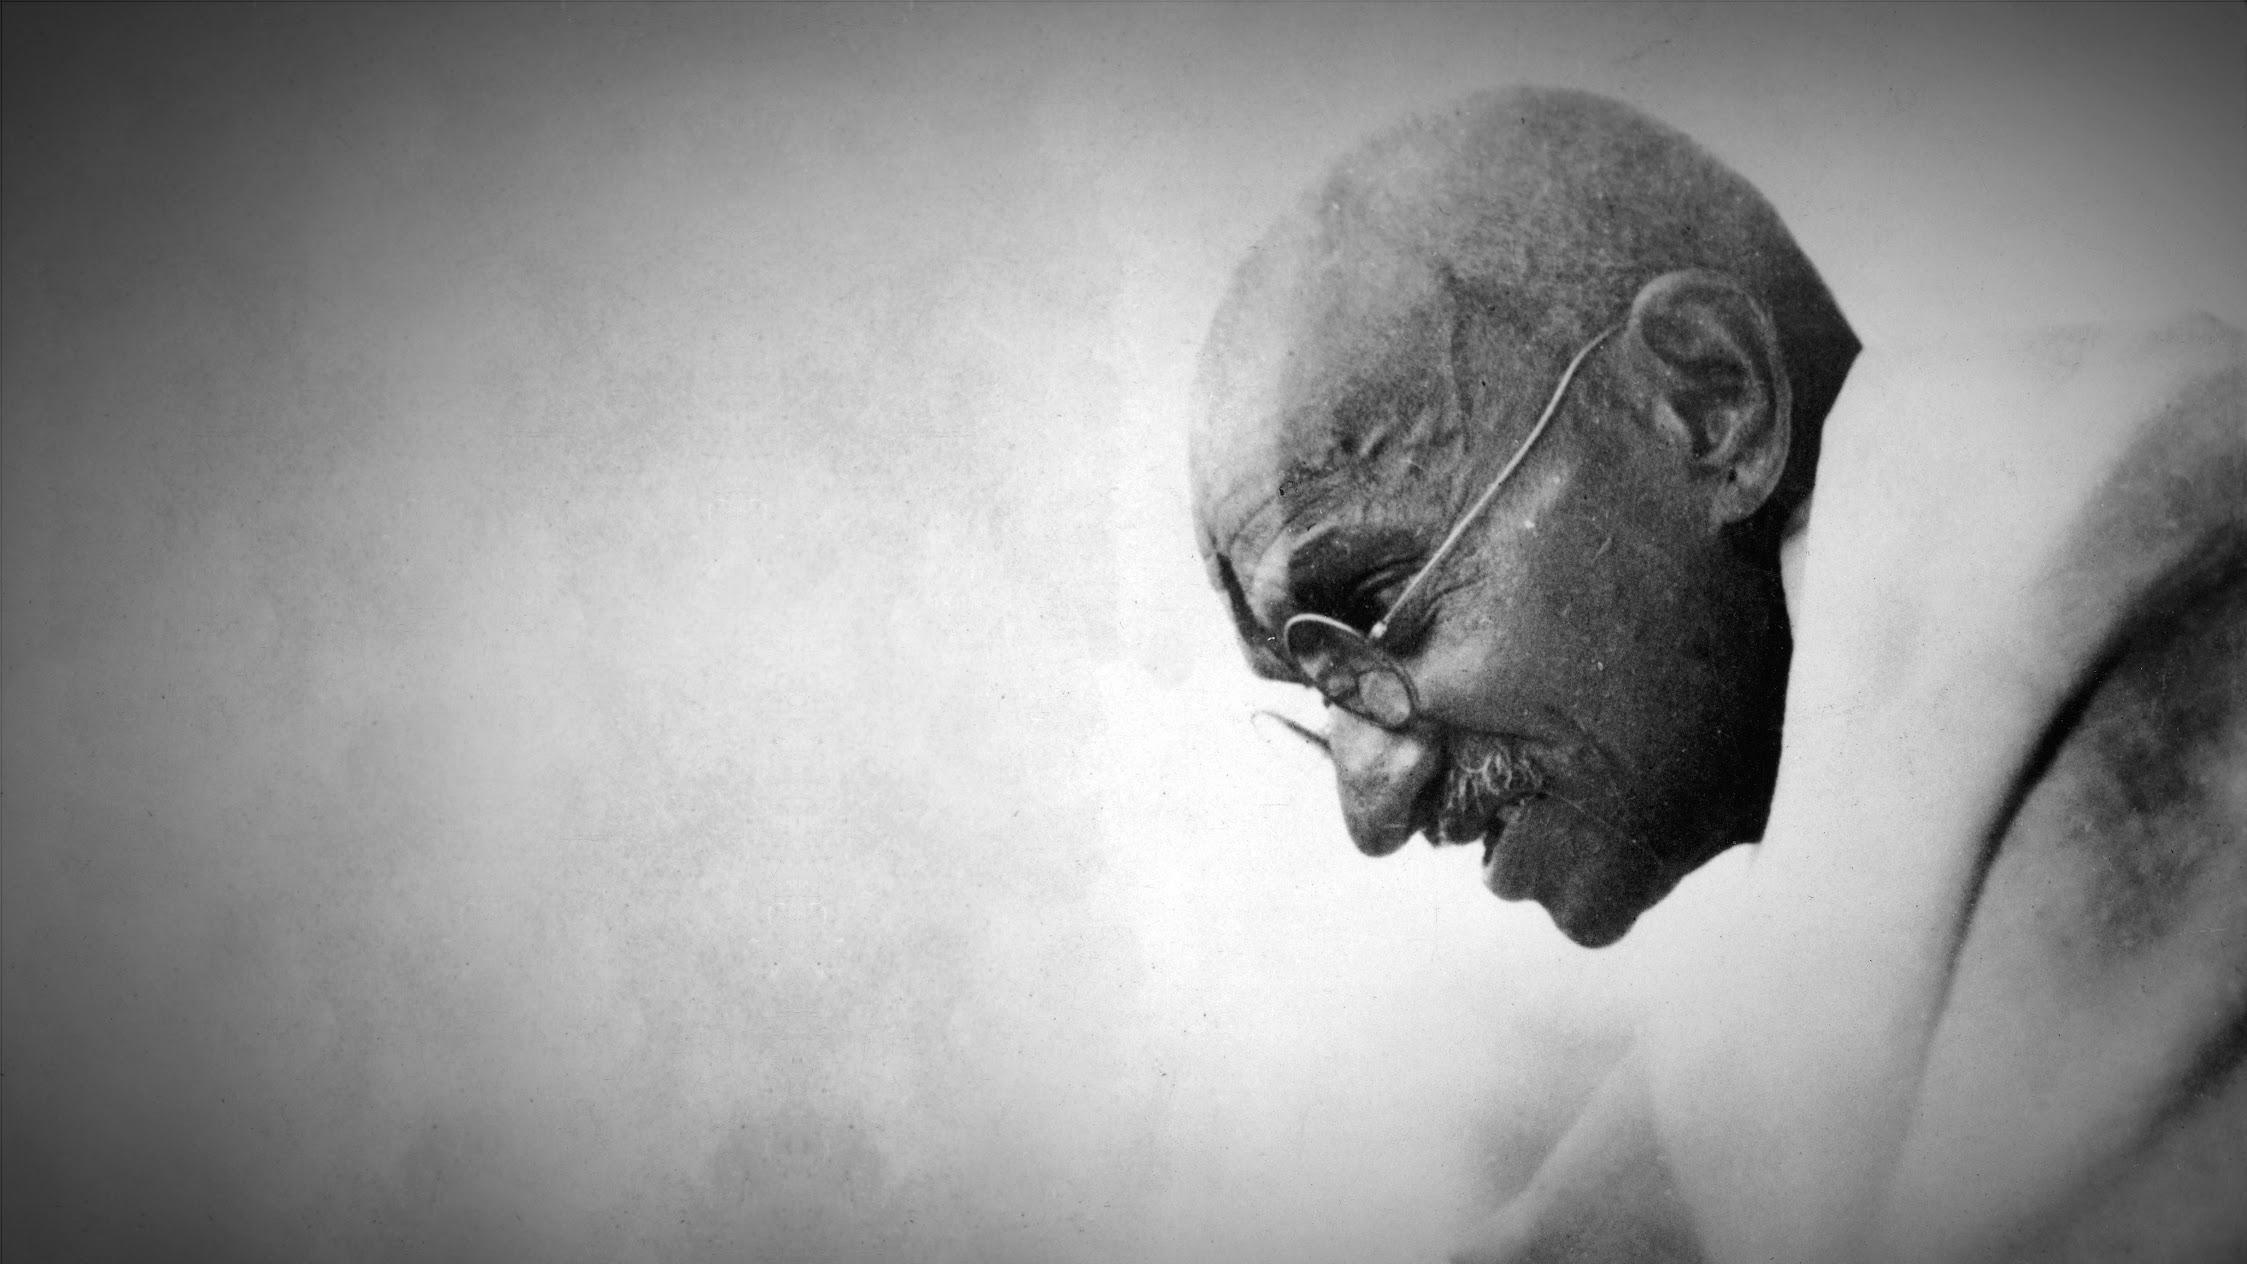 Mahatma Gandhi: Tak Pernah Punya Tujuan Menaklukkan Tetapi Justru Merangkul Musuh Jadi Sahabat